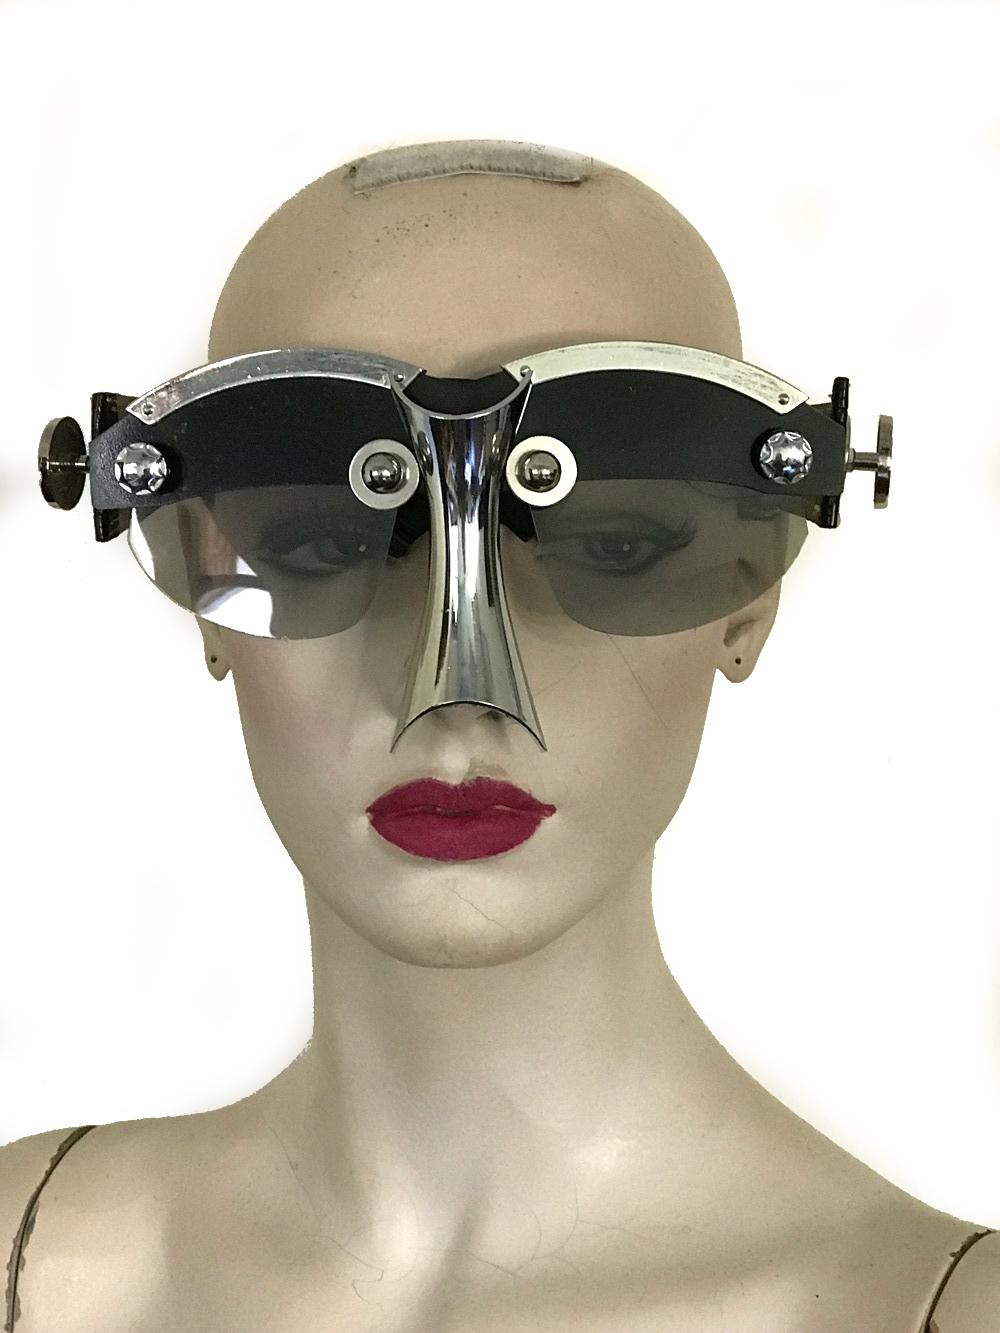 handmade futuristic modern steampunk eyewear for artists Spartan nose shield